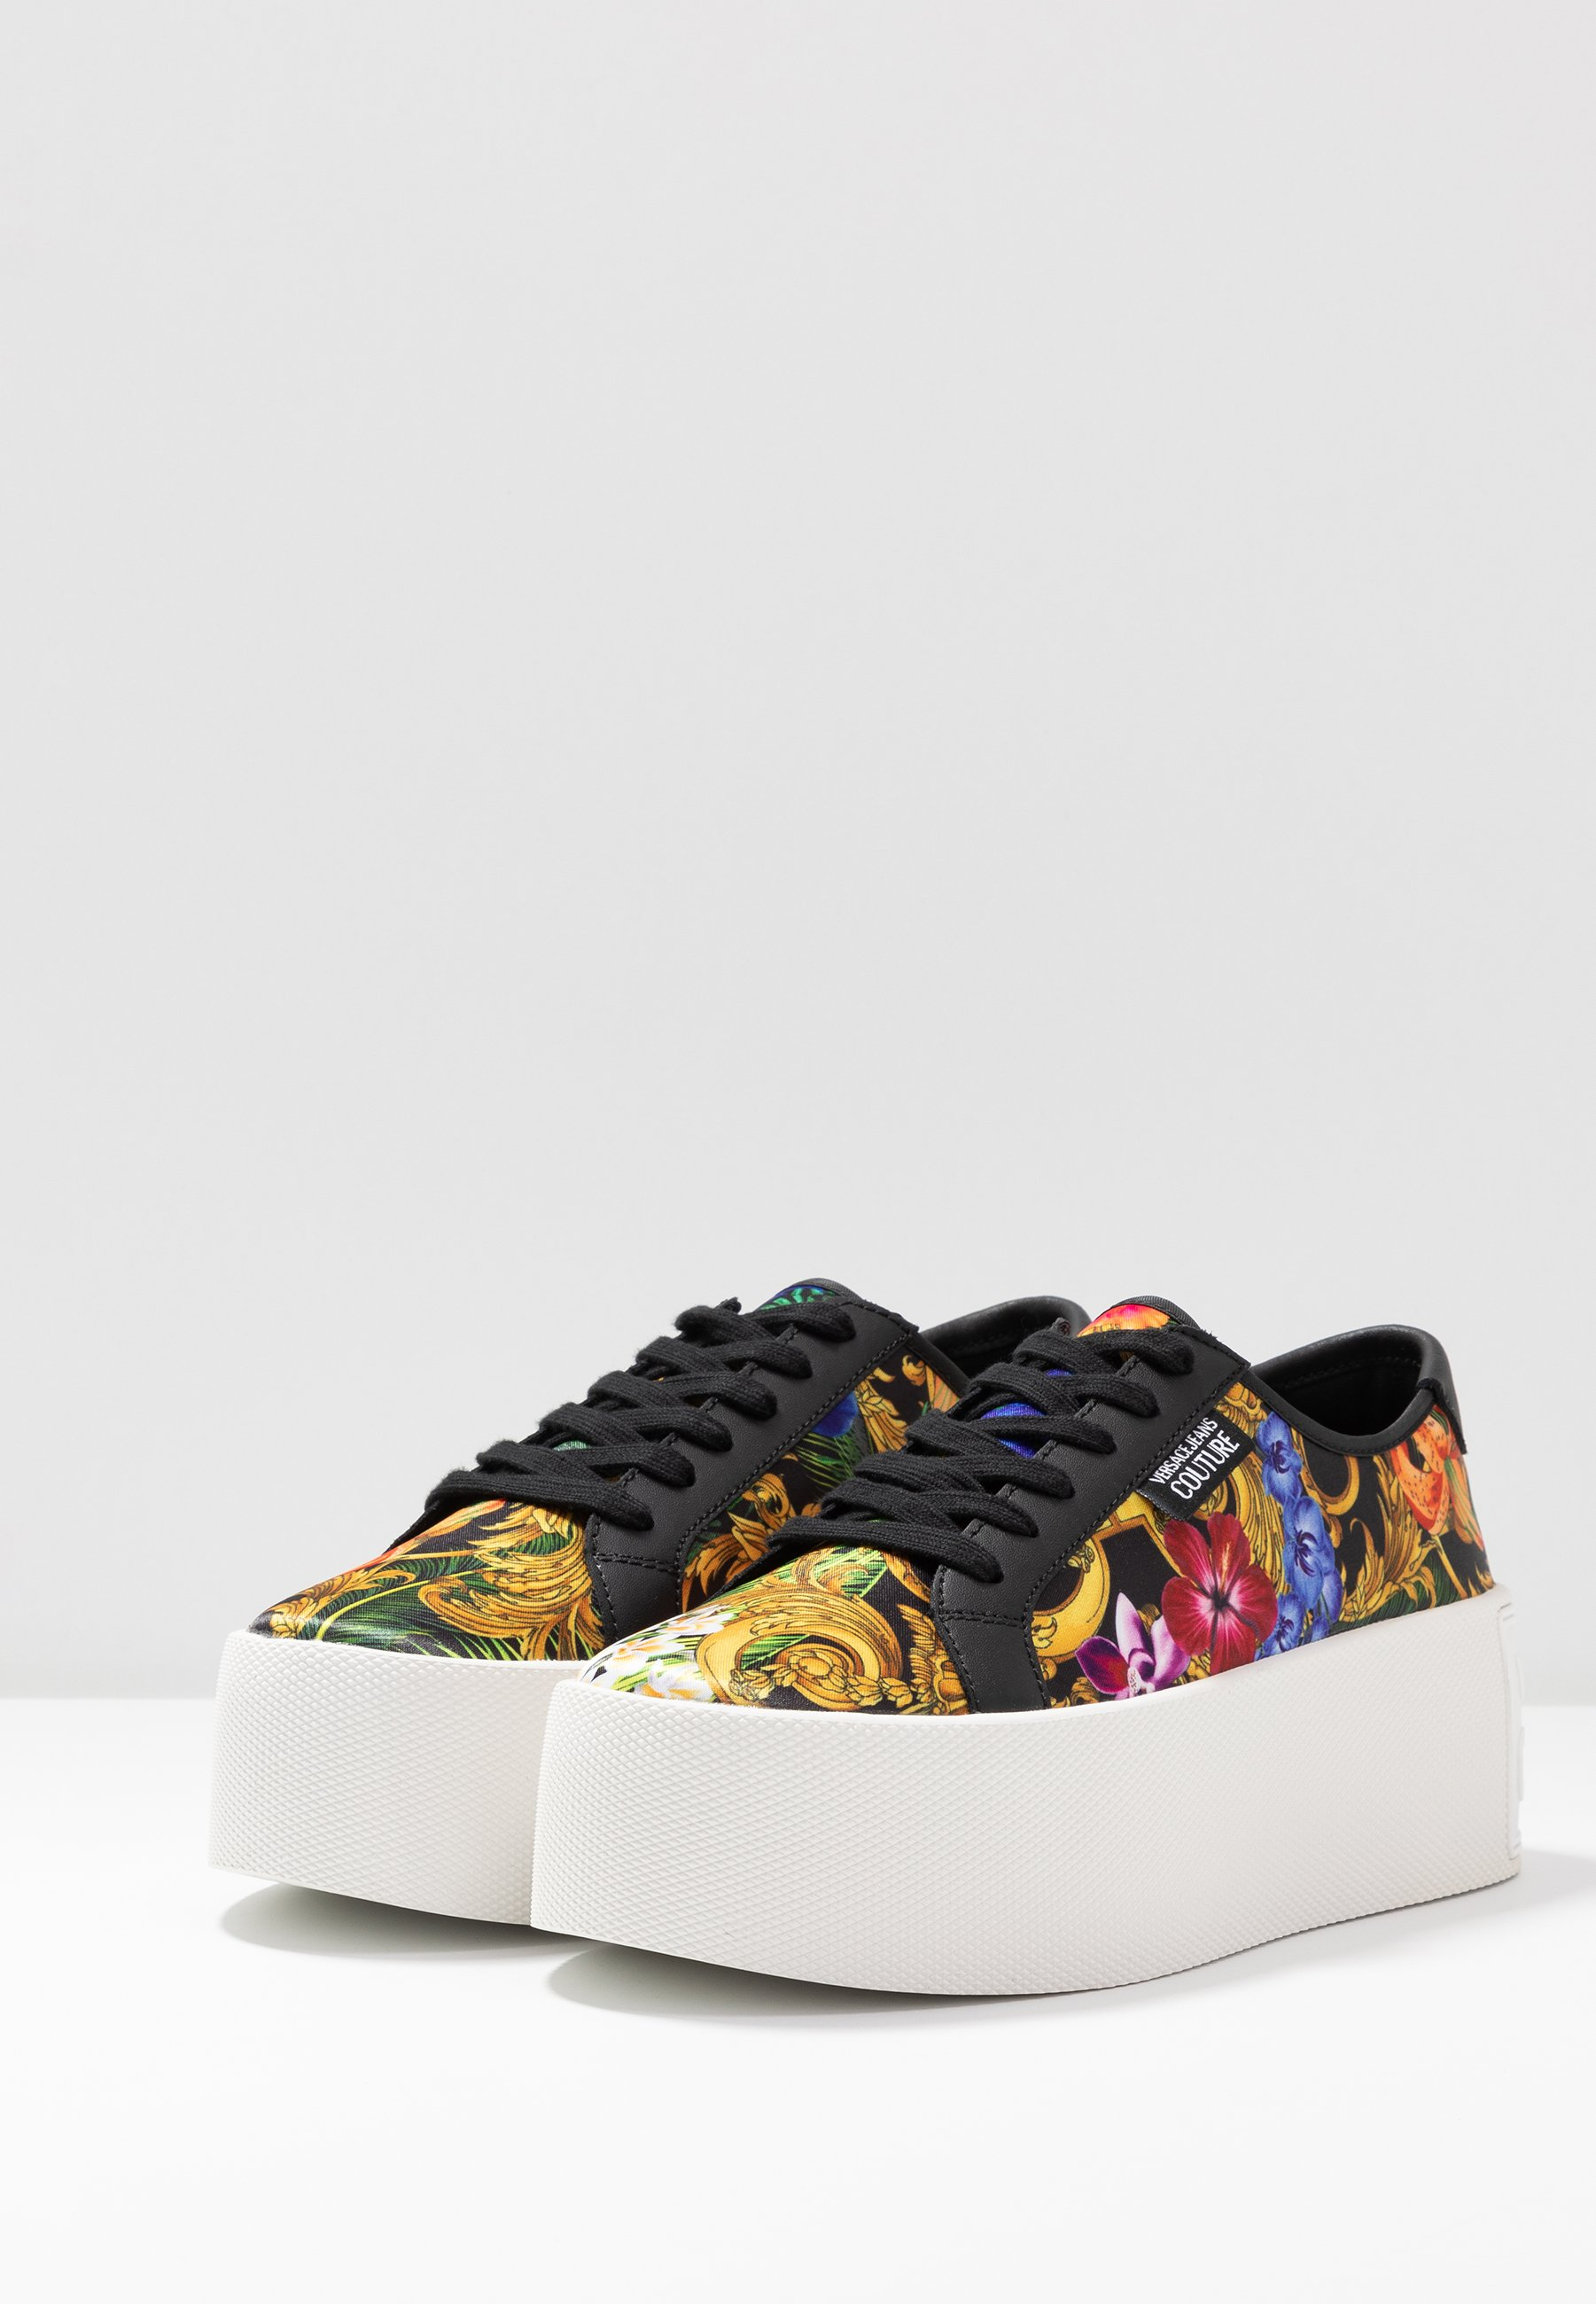 Versace Jeans Couture Joggesko multicolor Zalando.no